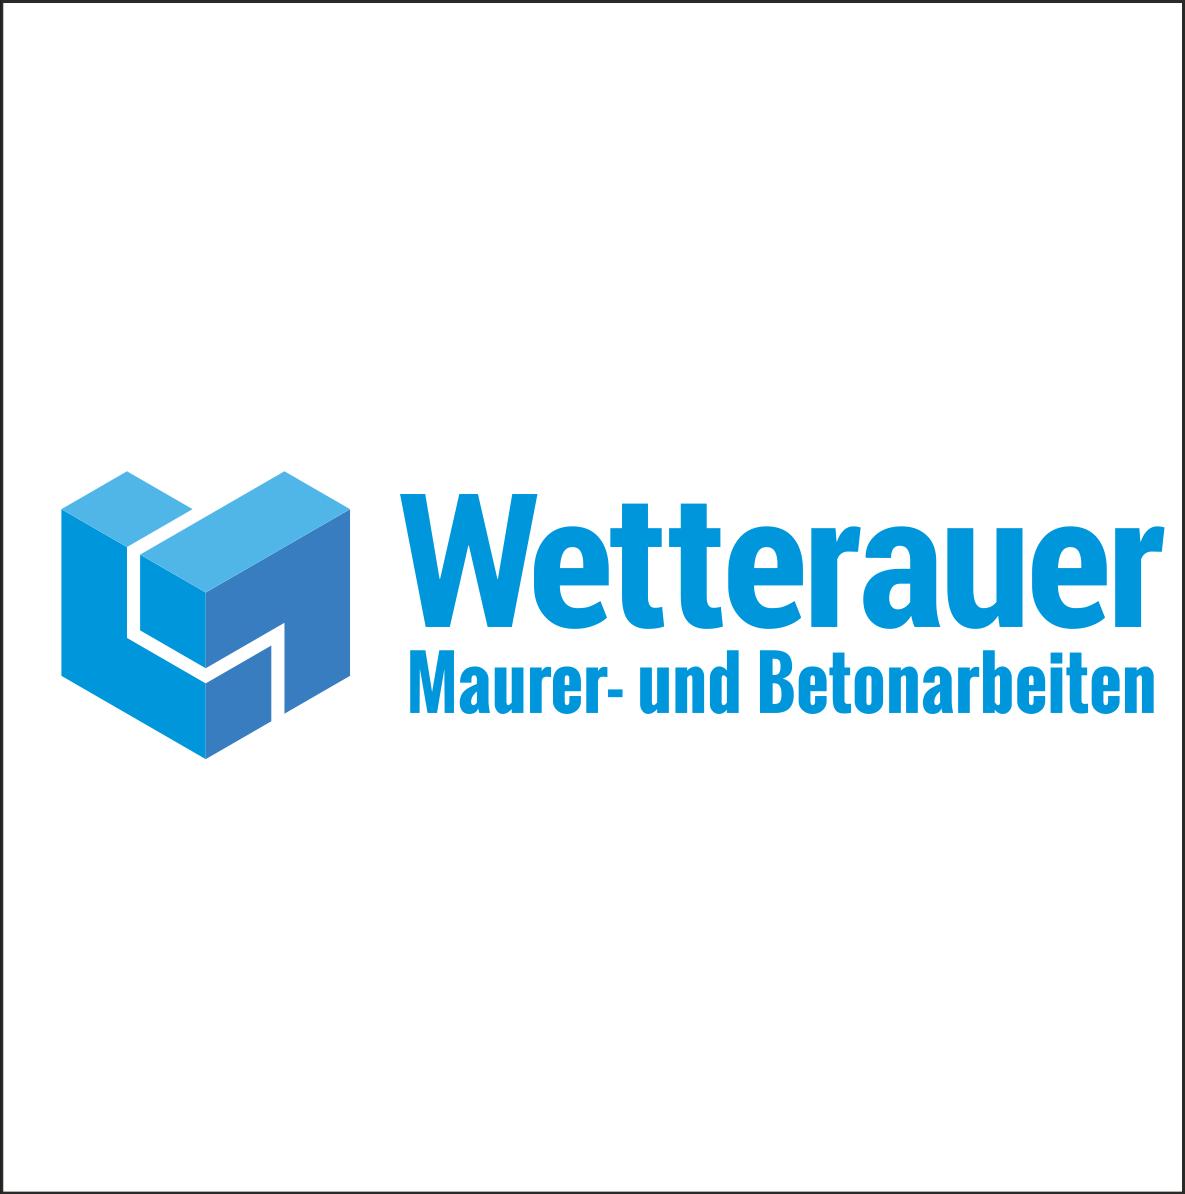 Wetterauer Maurer